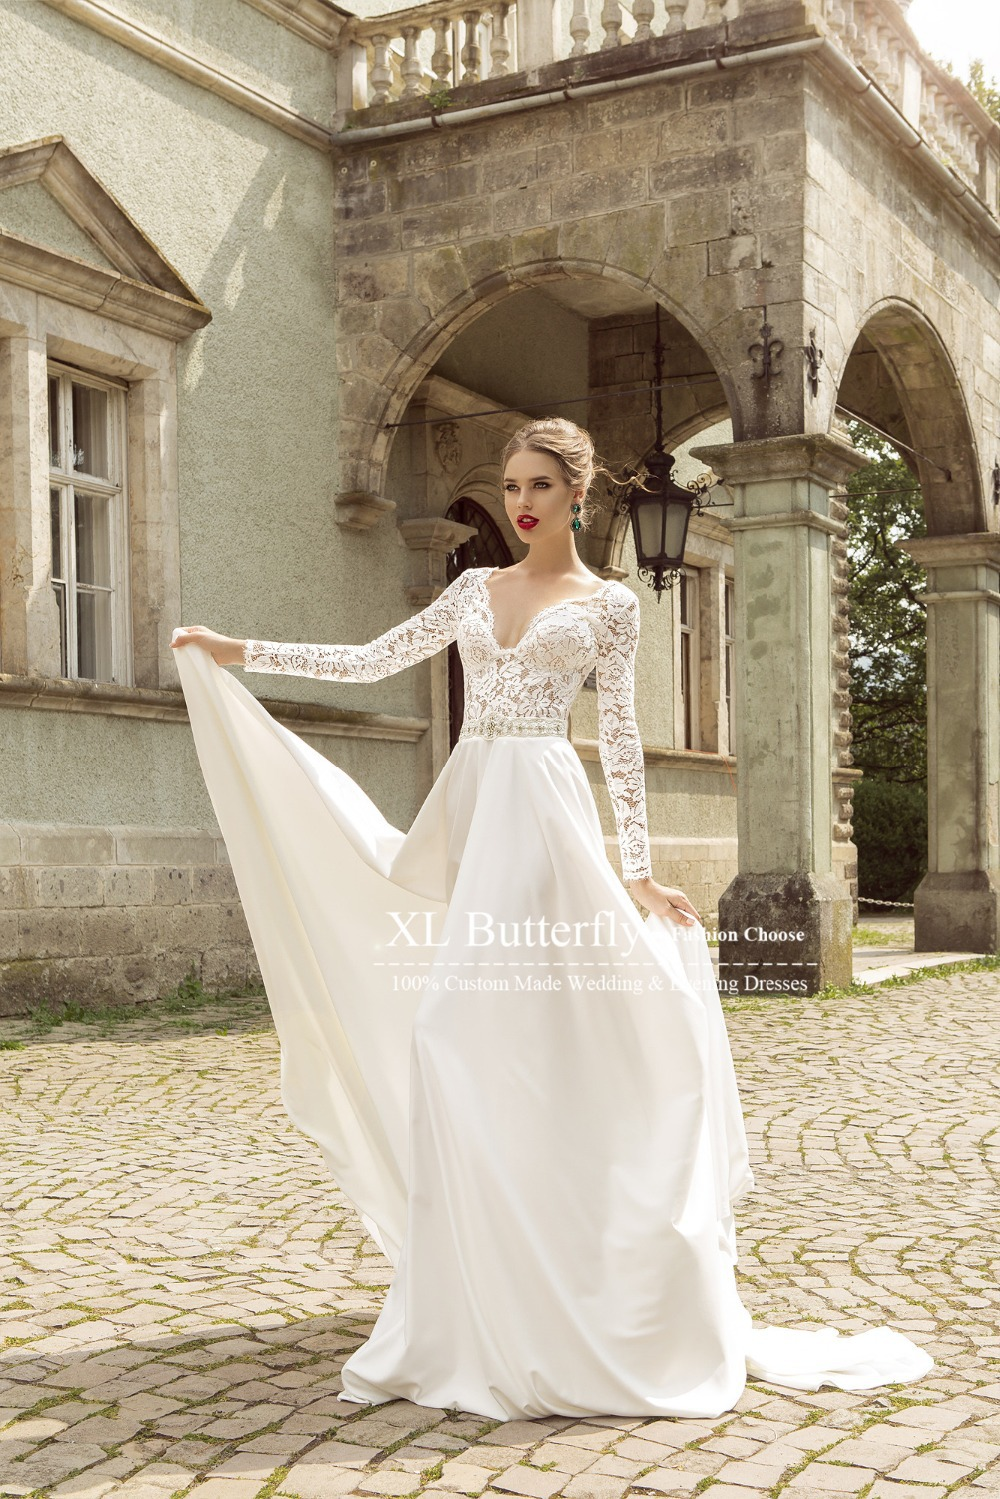 long sleeve wedding dresses wedding dress long sleeve Great Copy Have Long Sleeve Wedding Dresses